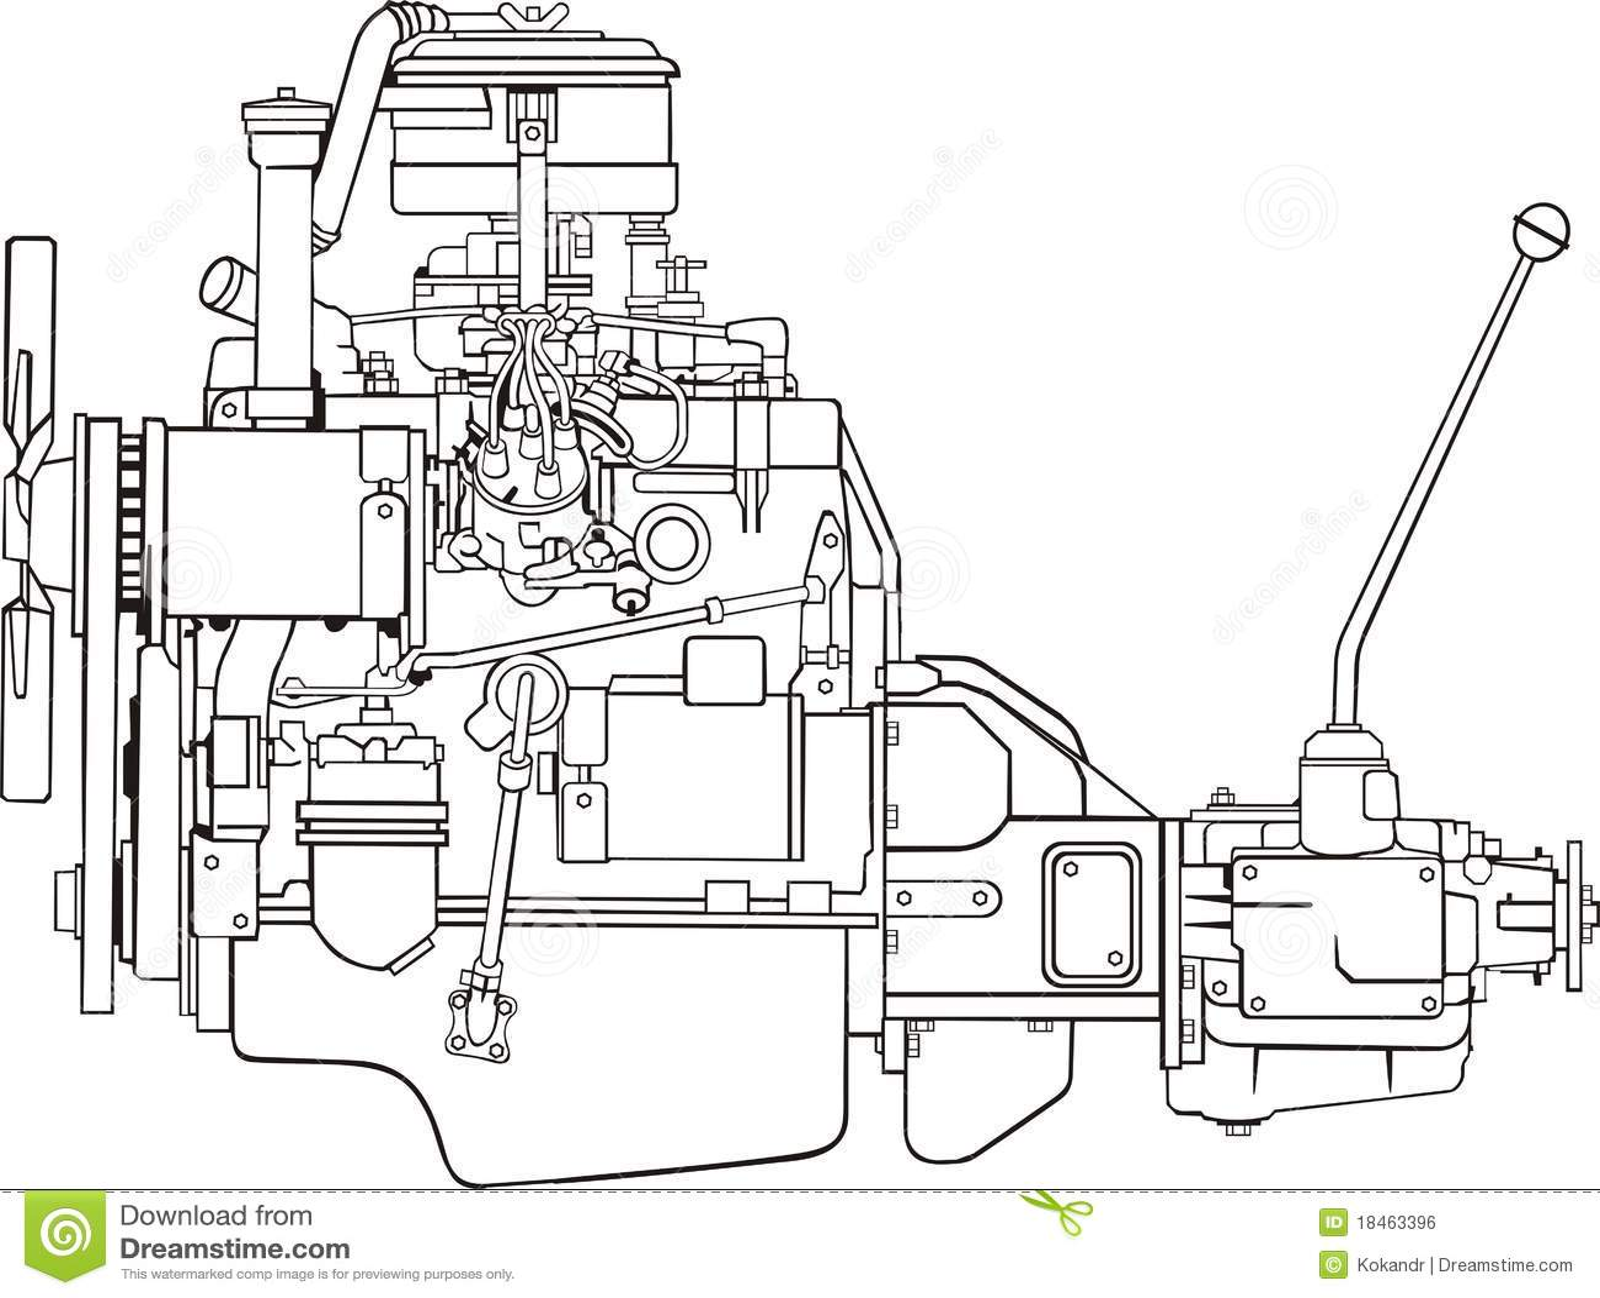 Engine contour stock vector. Illustration of gear, motor